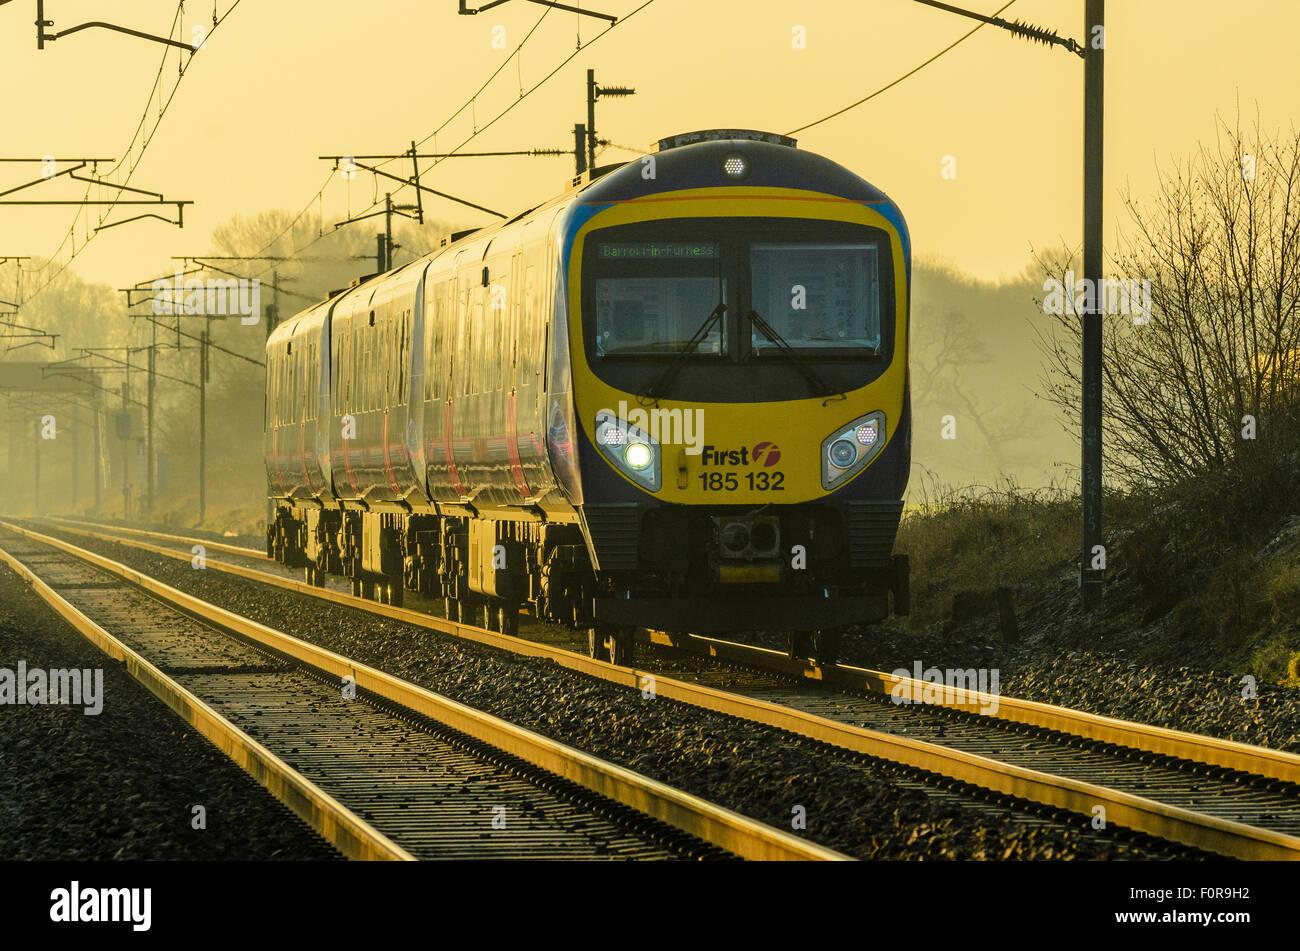 First TransPennine Express diesel train on the West Coast Main Line near Garstang Lancashire - Stock Image